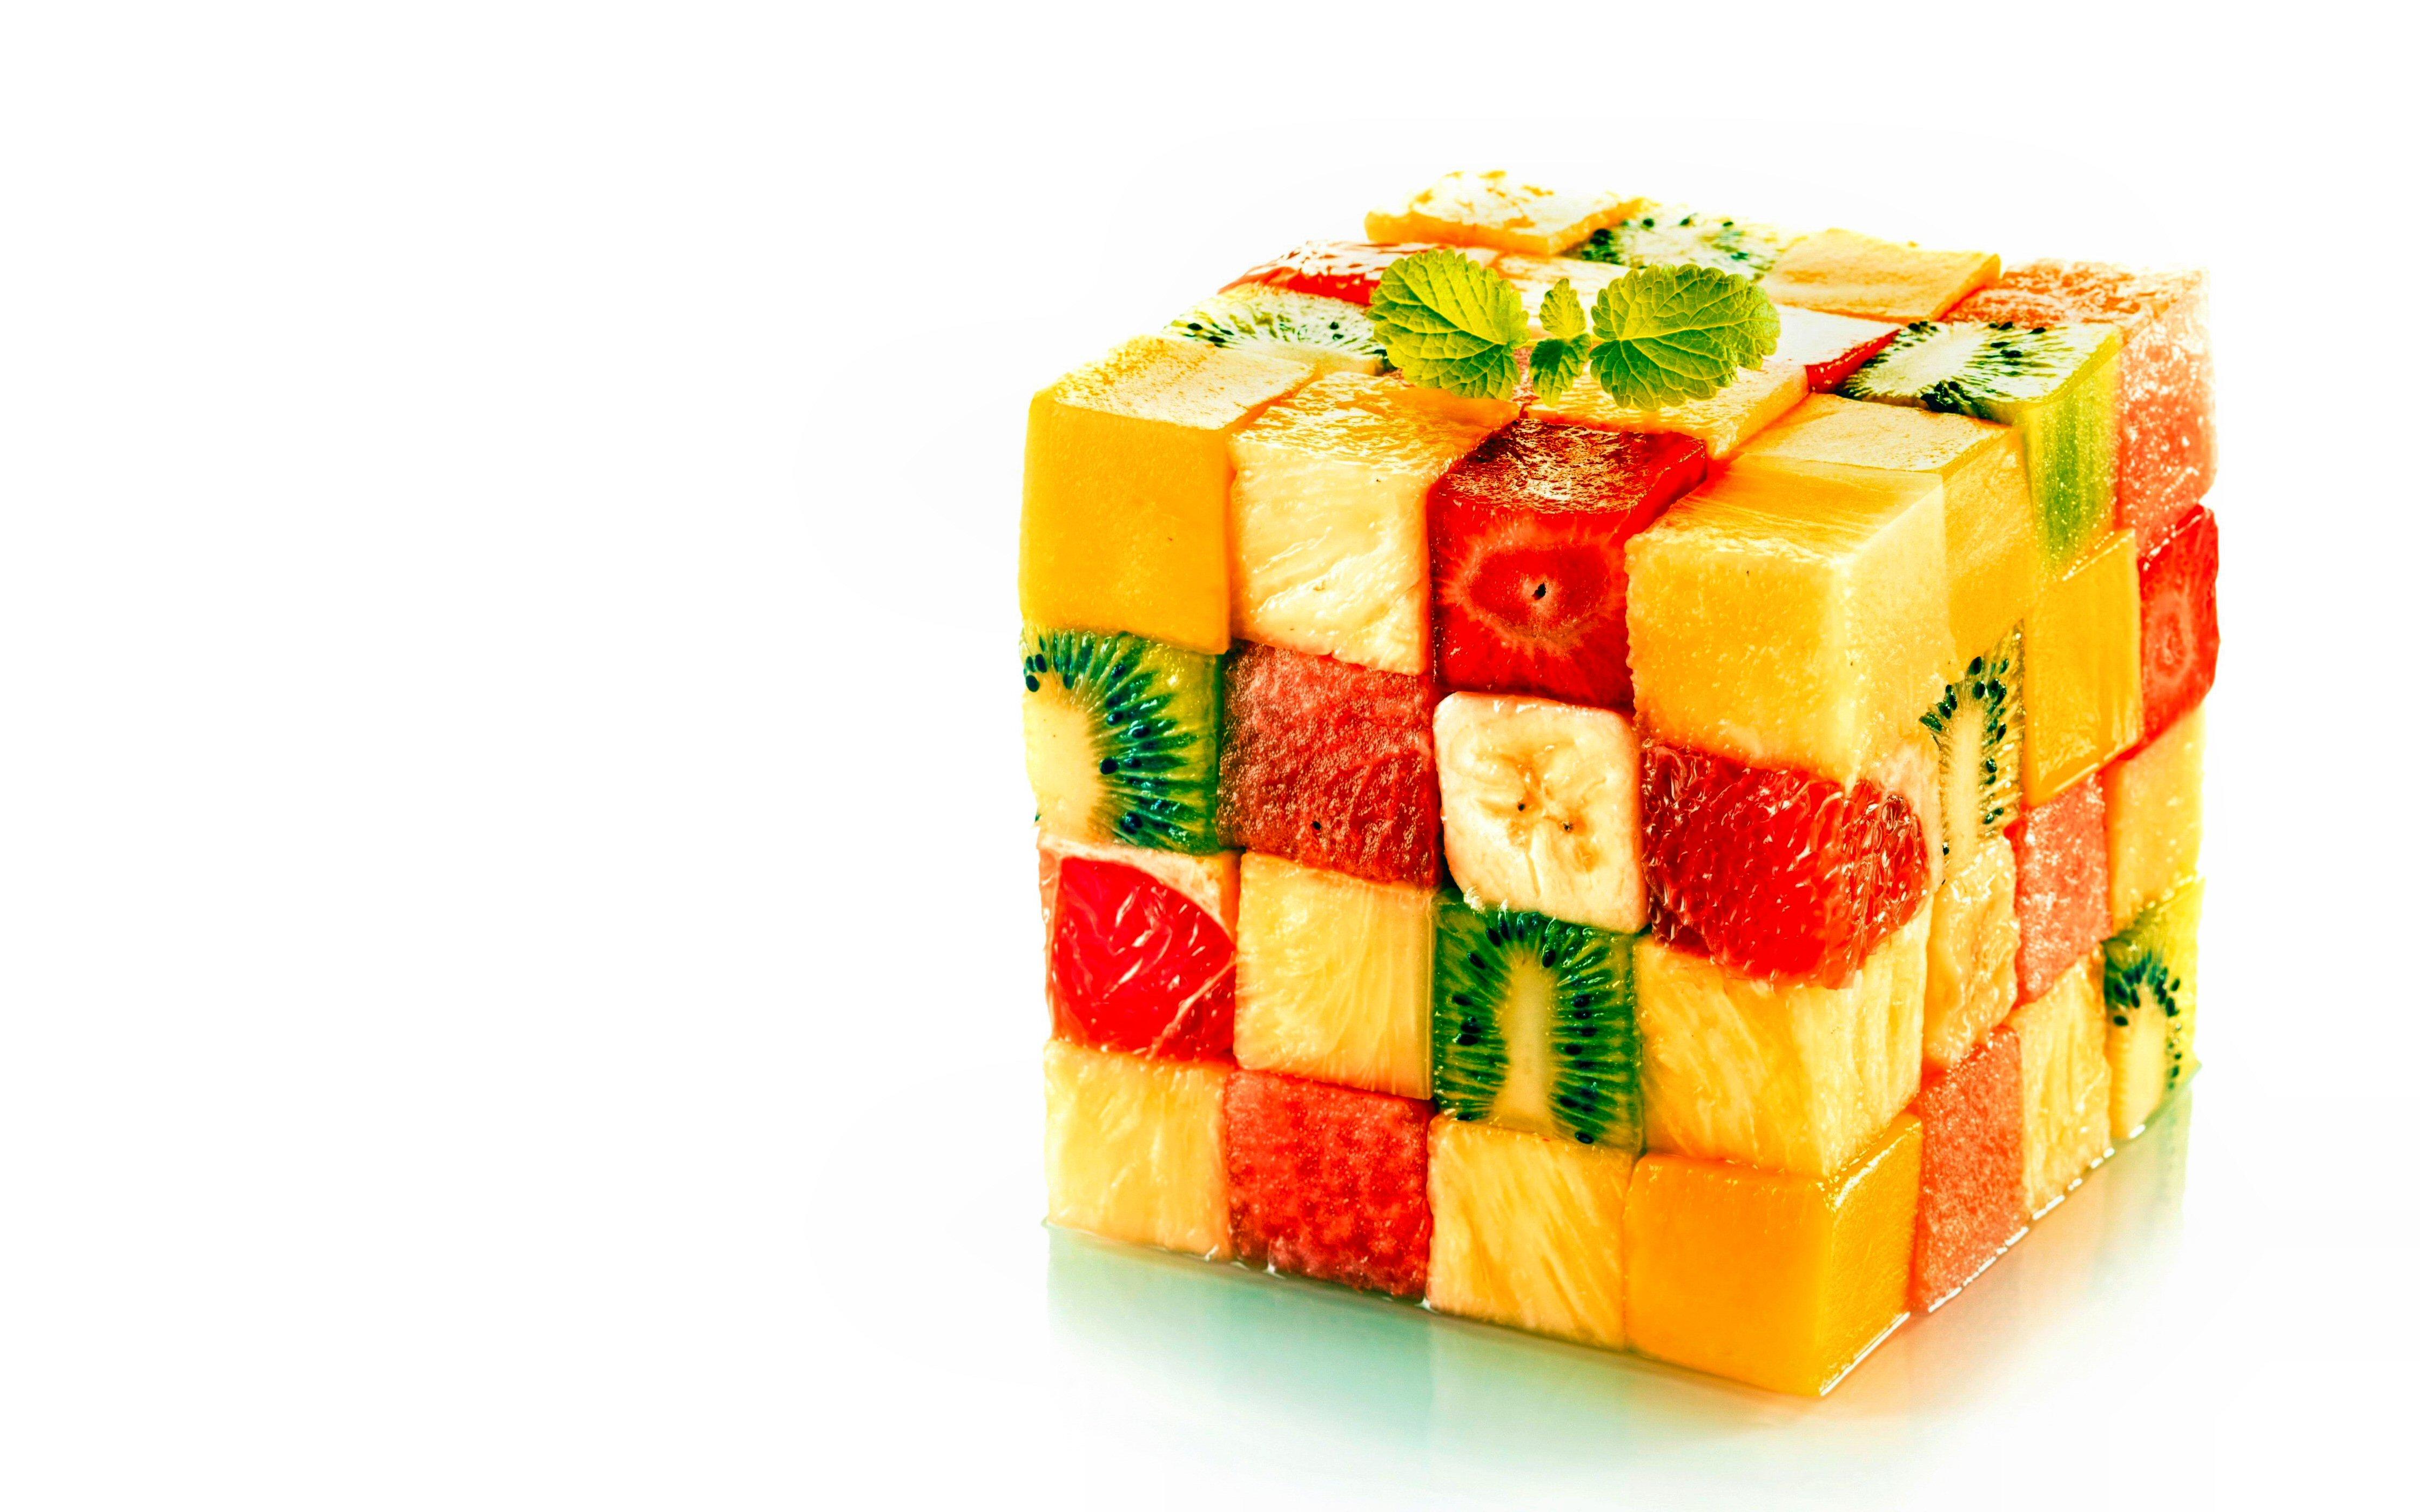 food cube widescreen wallpaper 70301